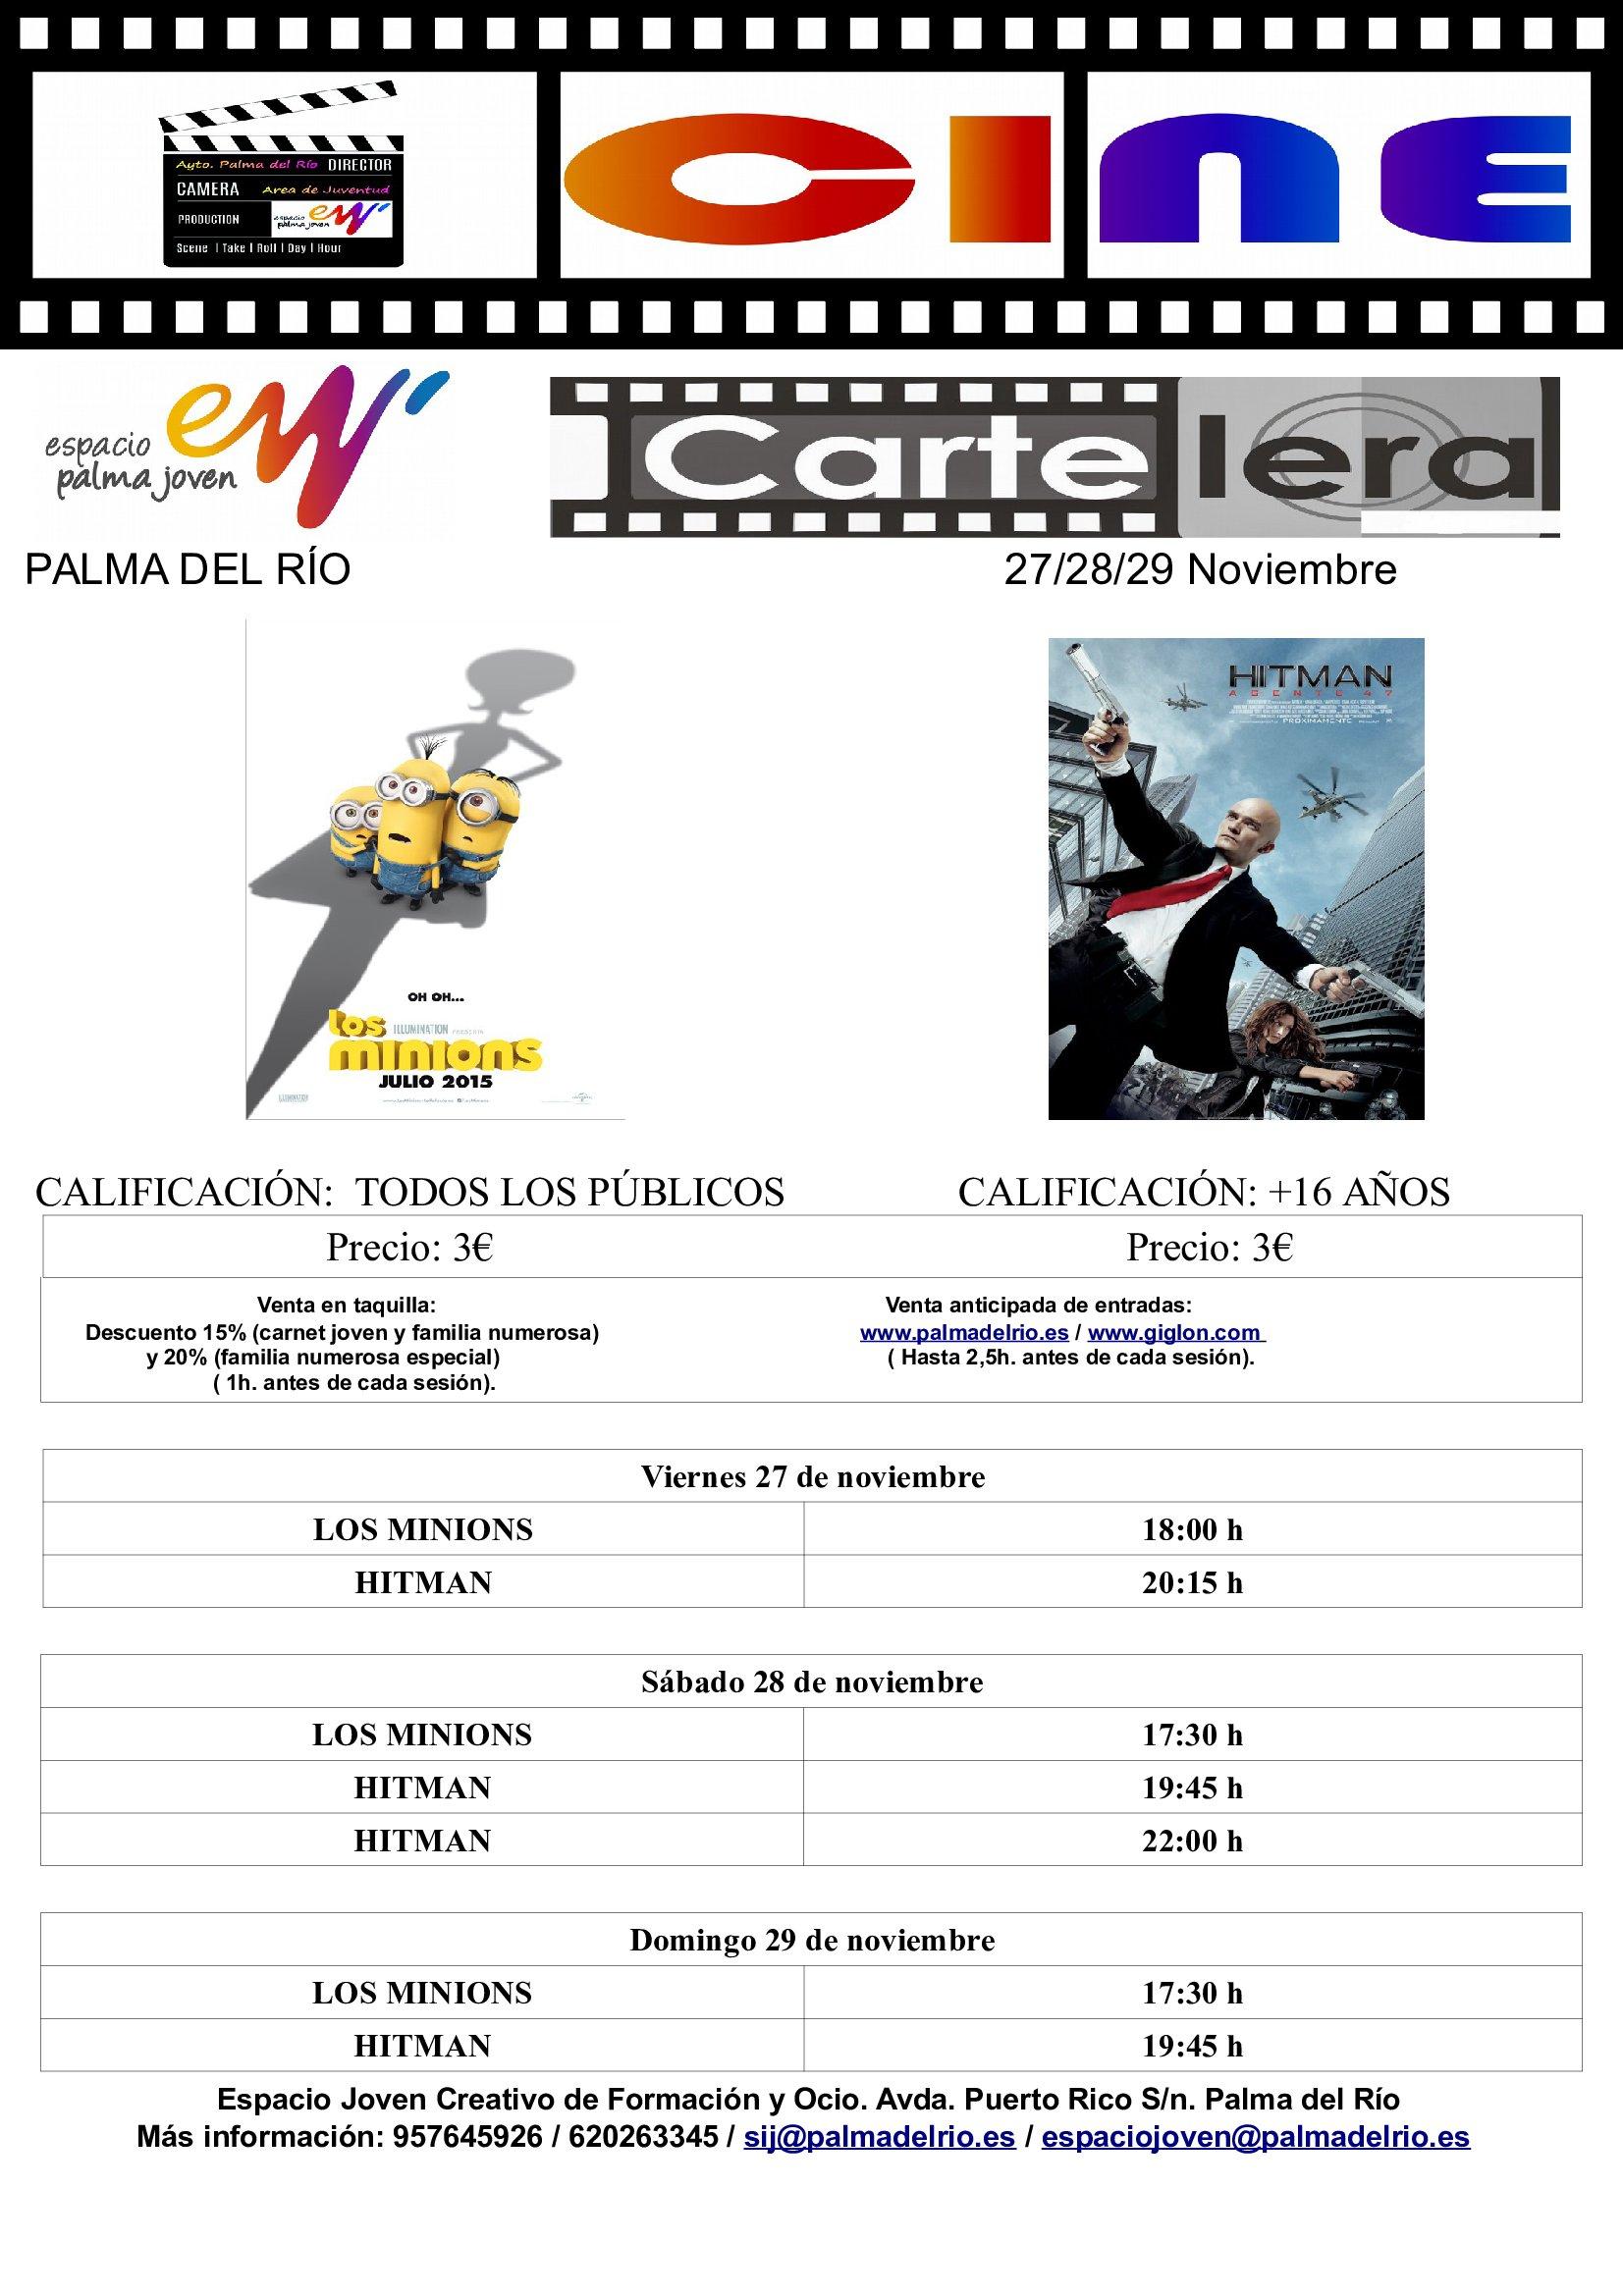 https://www.palmadelrio.es/sites/default/files/cartel_cine_27-29_noviembre.jpg